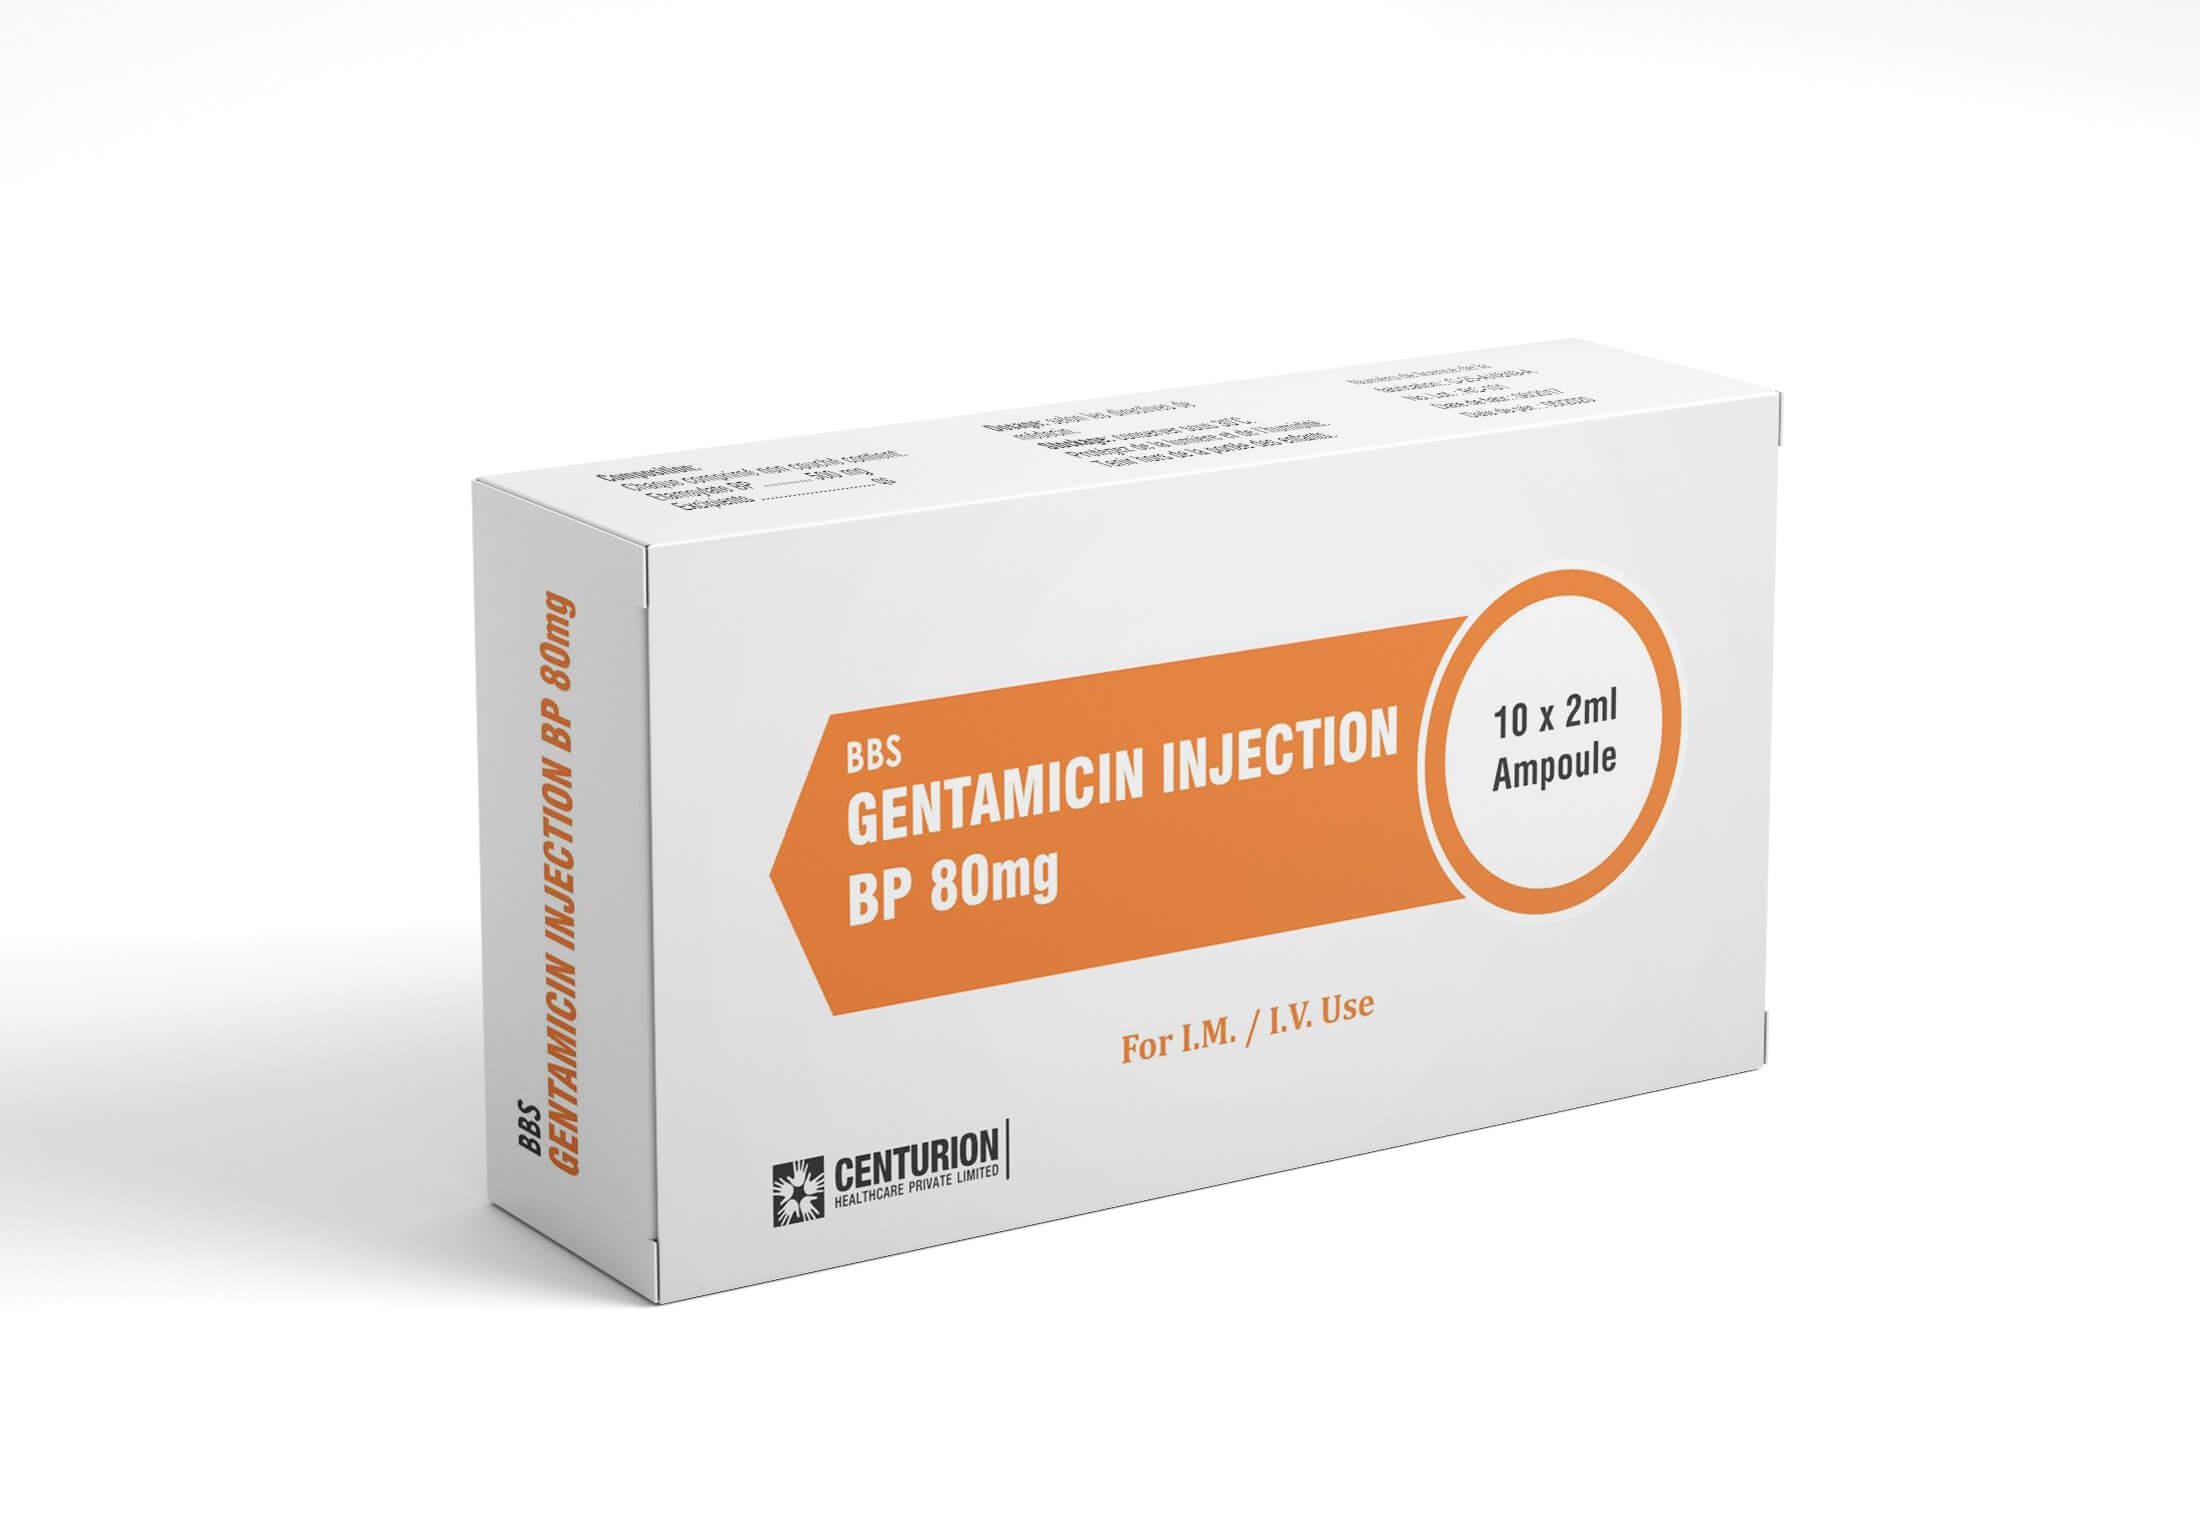 Gentamicin Injection BP 80mg